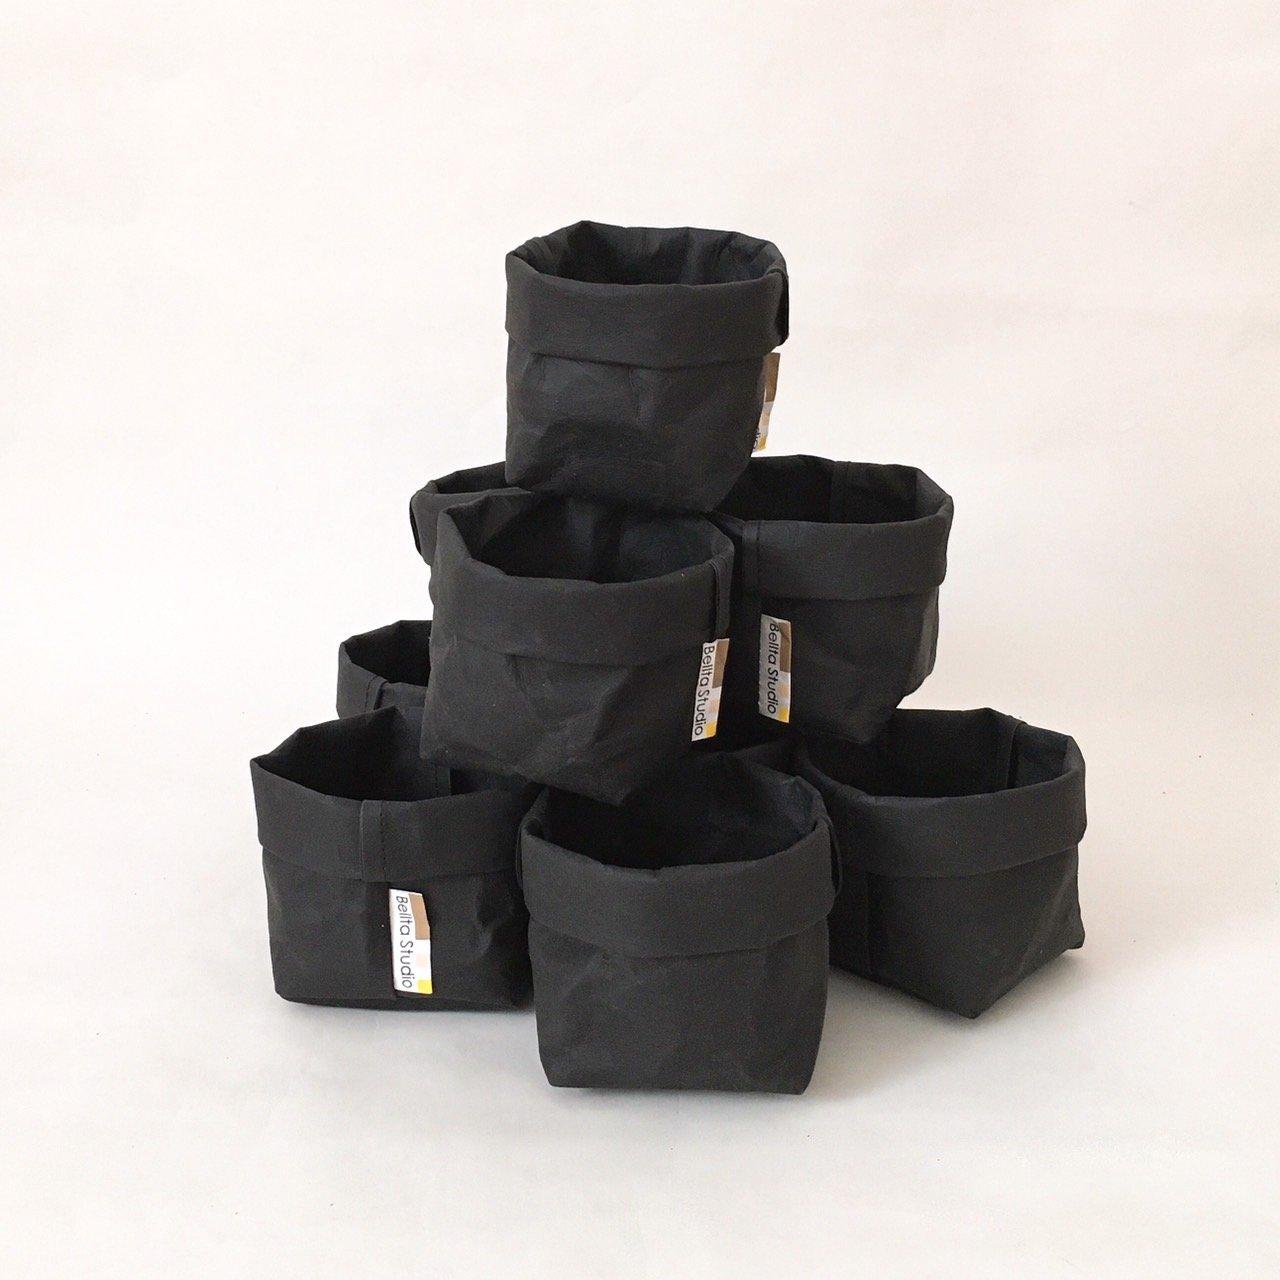 Kraft Paper STORAGE BASKET BLACK 3 x 3 x 3 inch